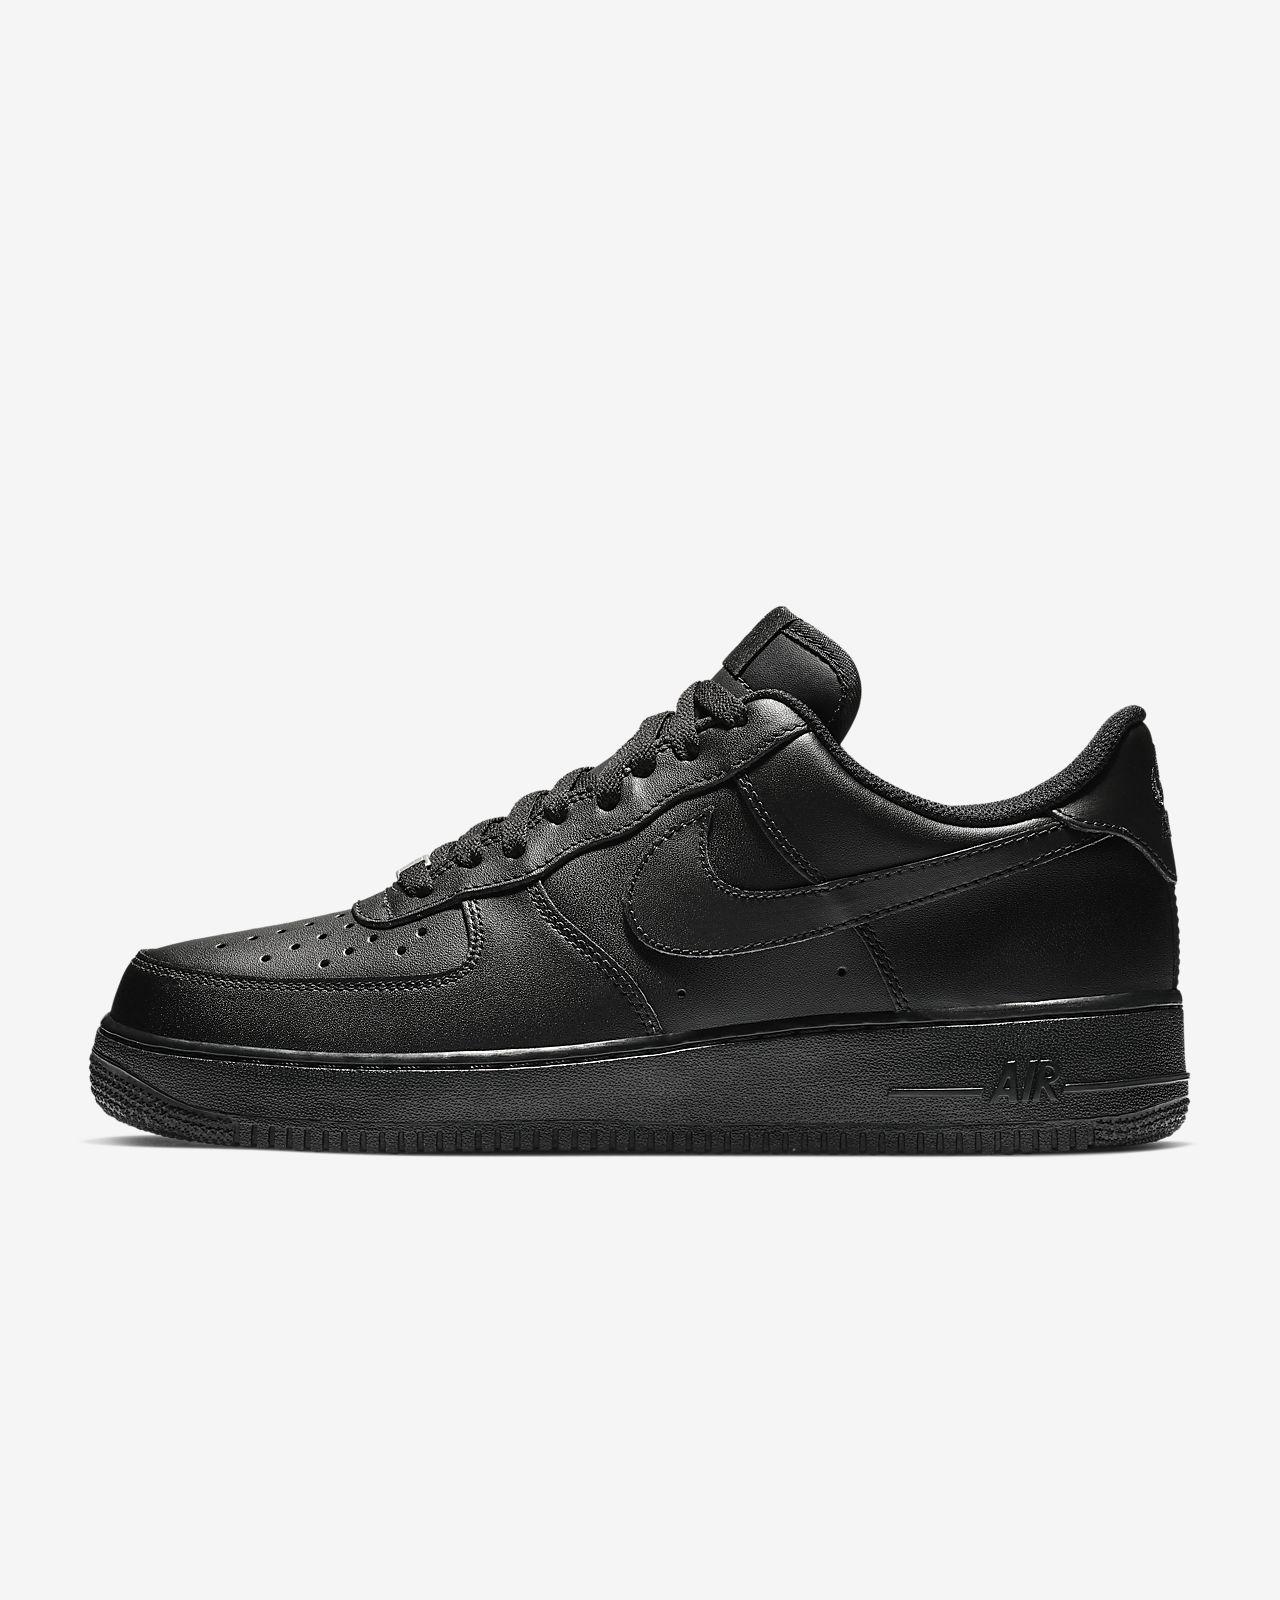 Nike Air Force 1 \u002707 Triple Black Men\u0027s Shoe